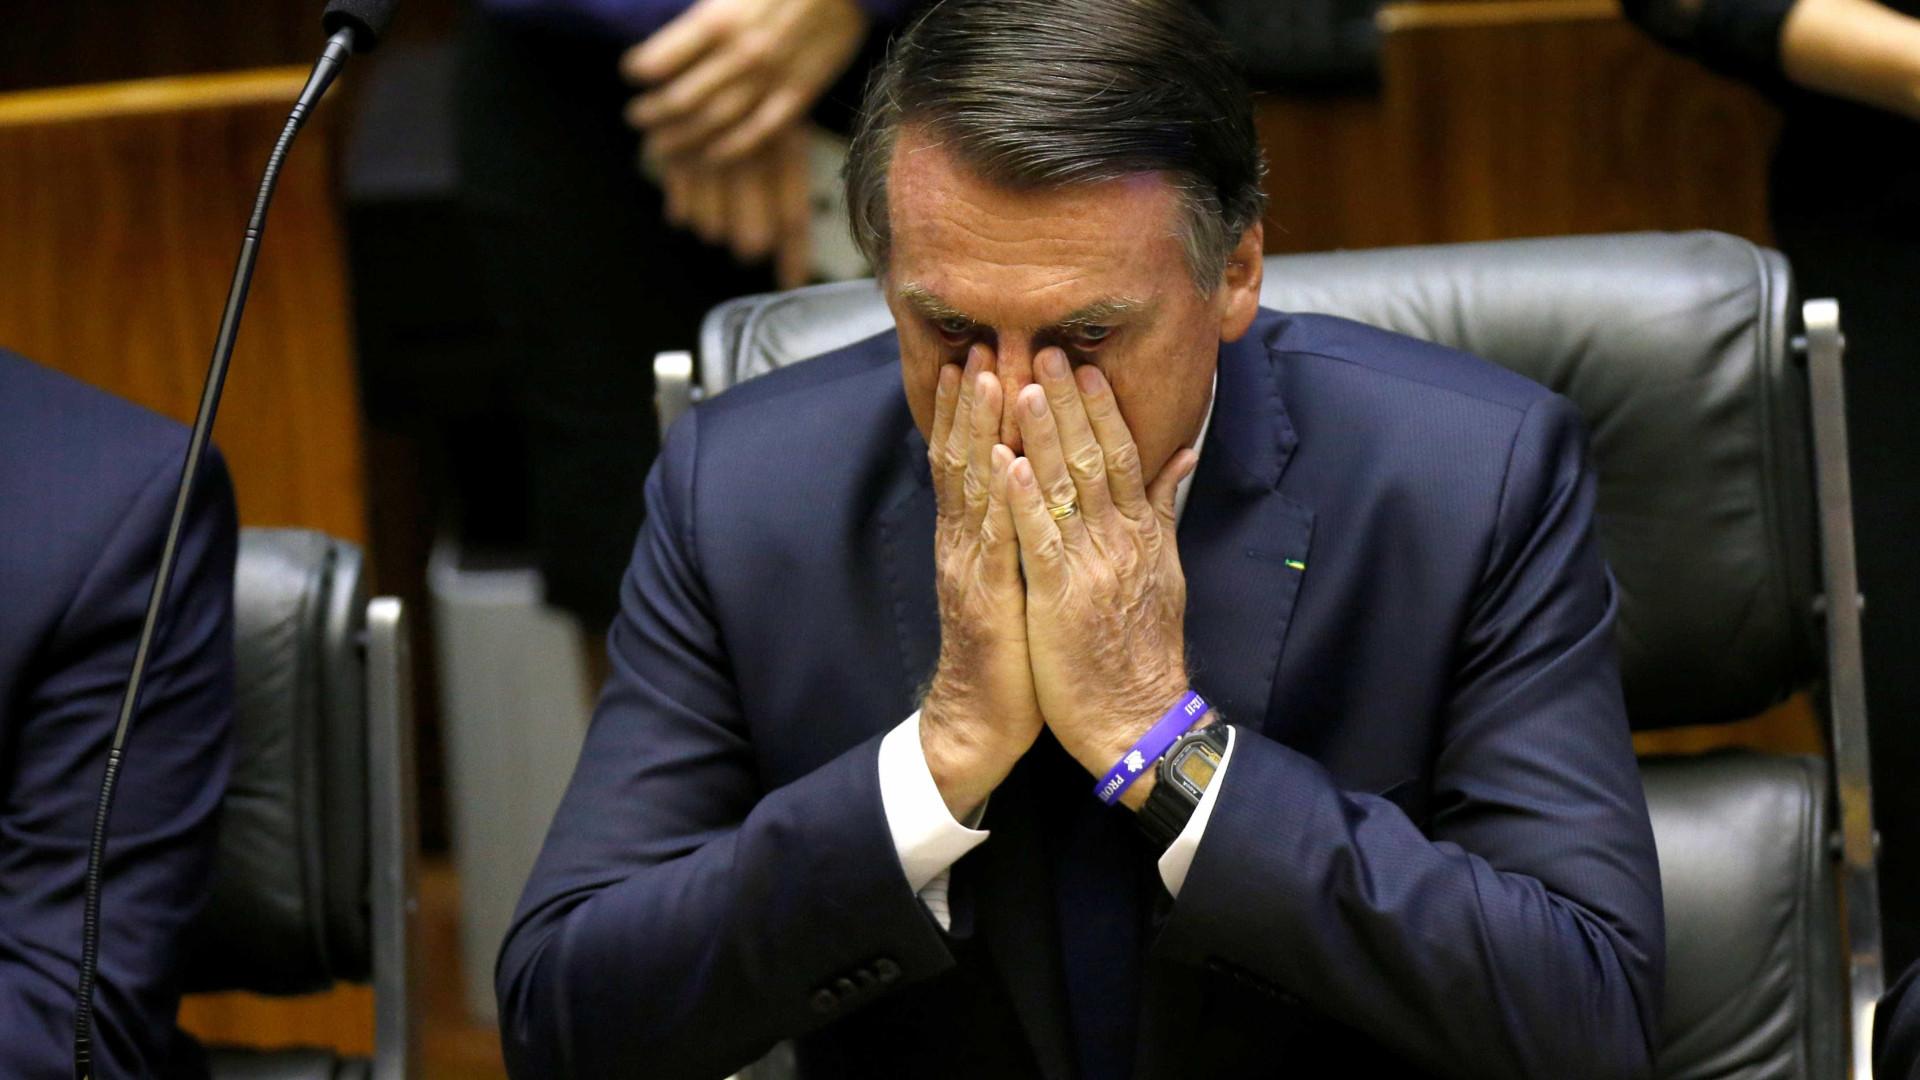 Jornalistas estrangeiros abandonam posse de Bolsonaro